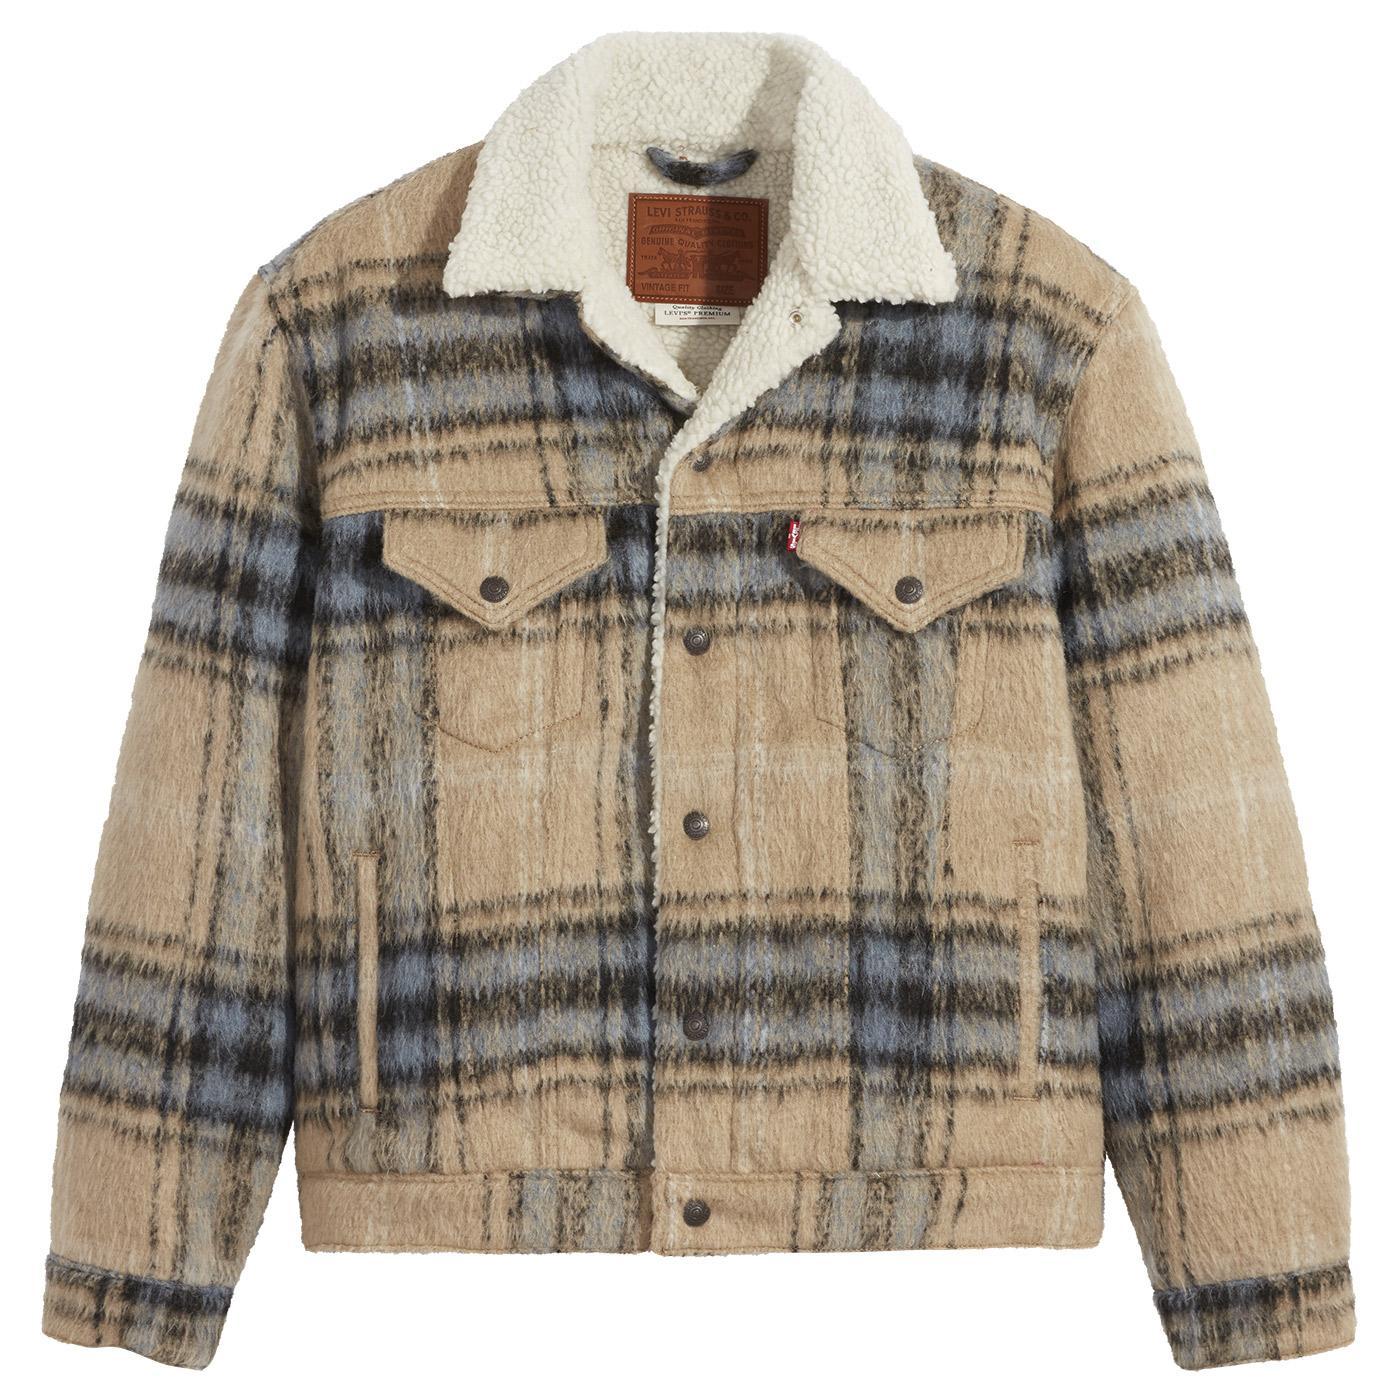 LEVI'S Vintage Fit 70s Check Sherpa Trucker Jacket